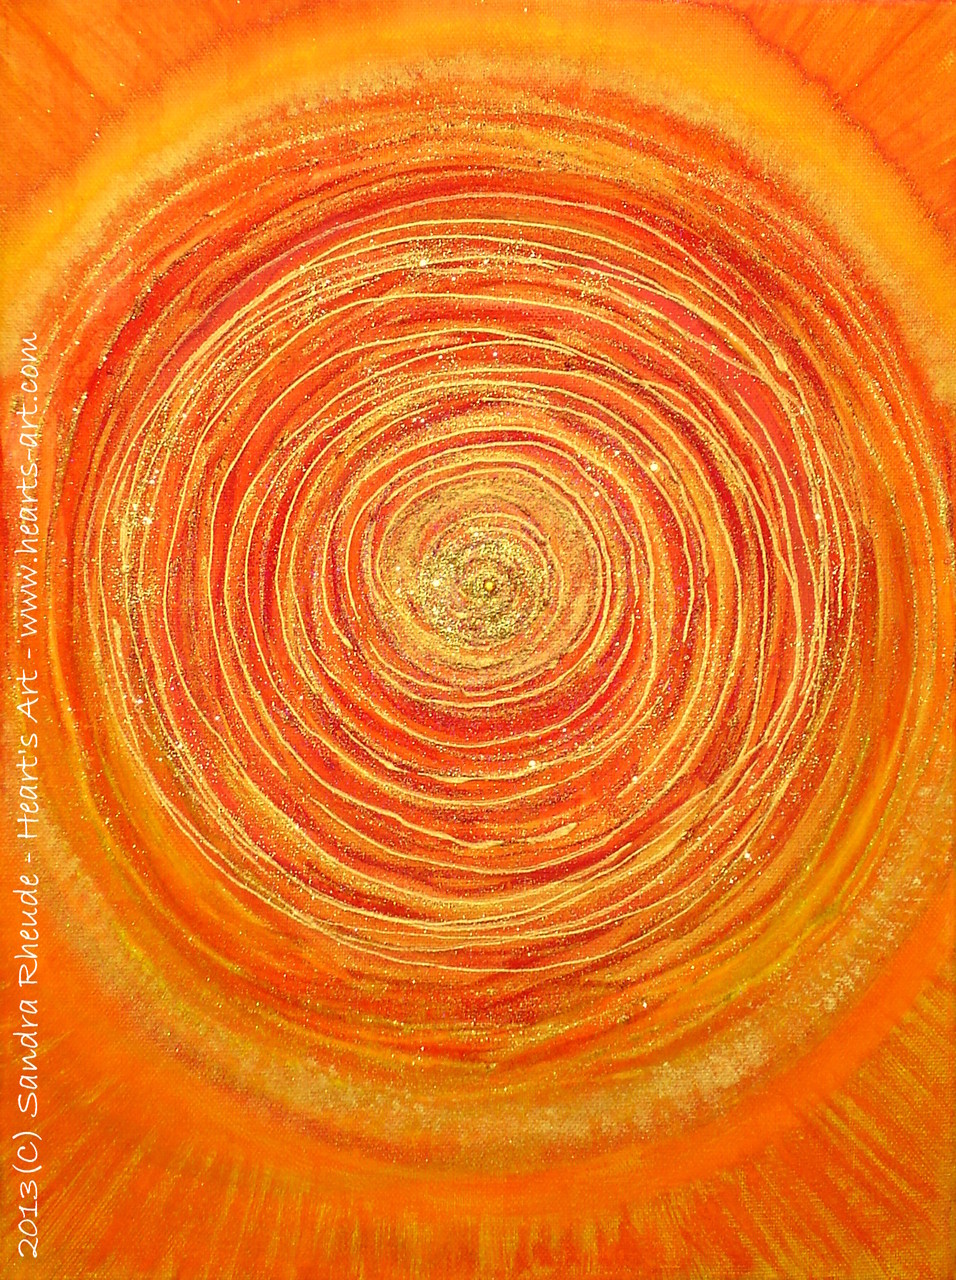 'Intuition' - 2013/68 - Acryl/MixedMedia auf Leinwand - 30 x 40 cm - € 130